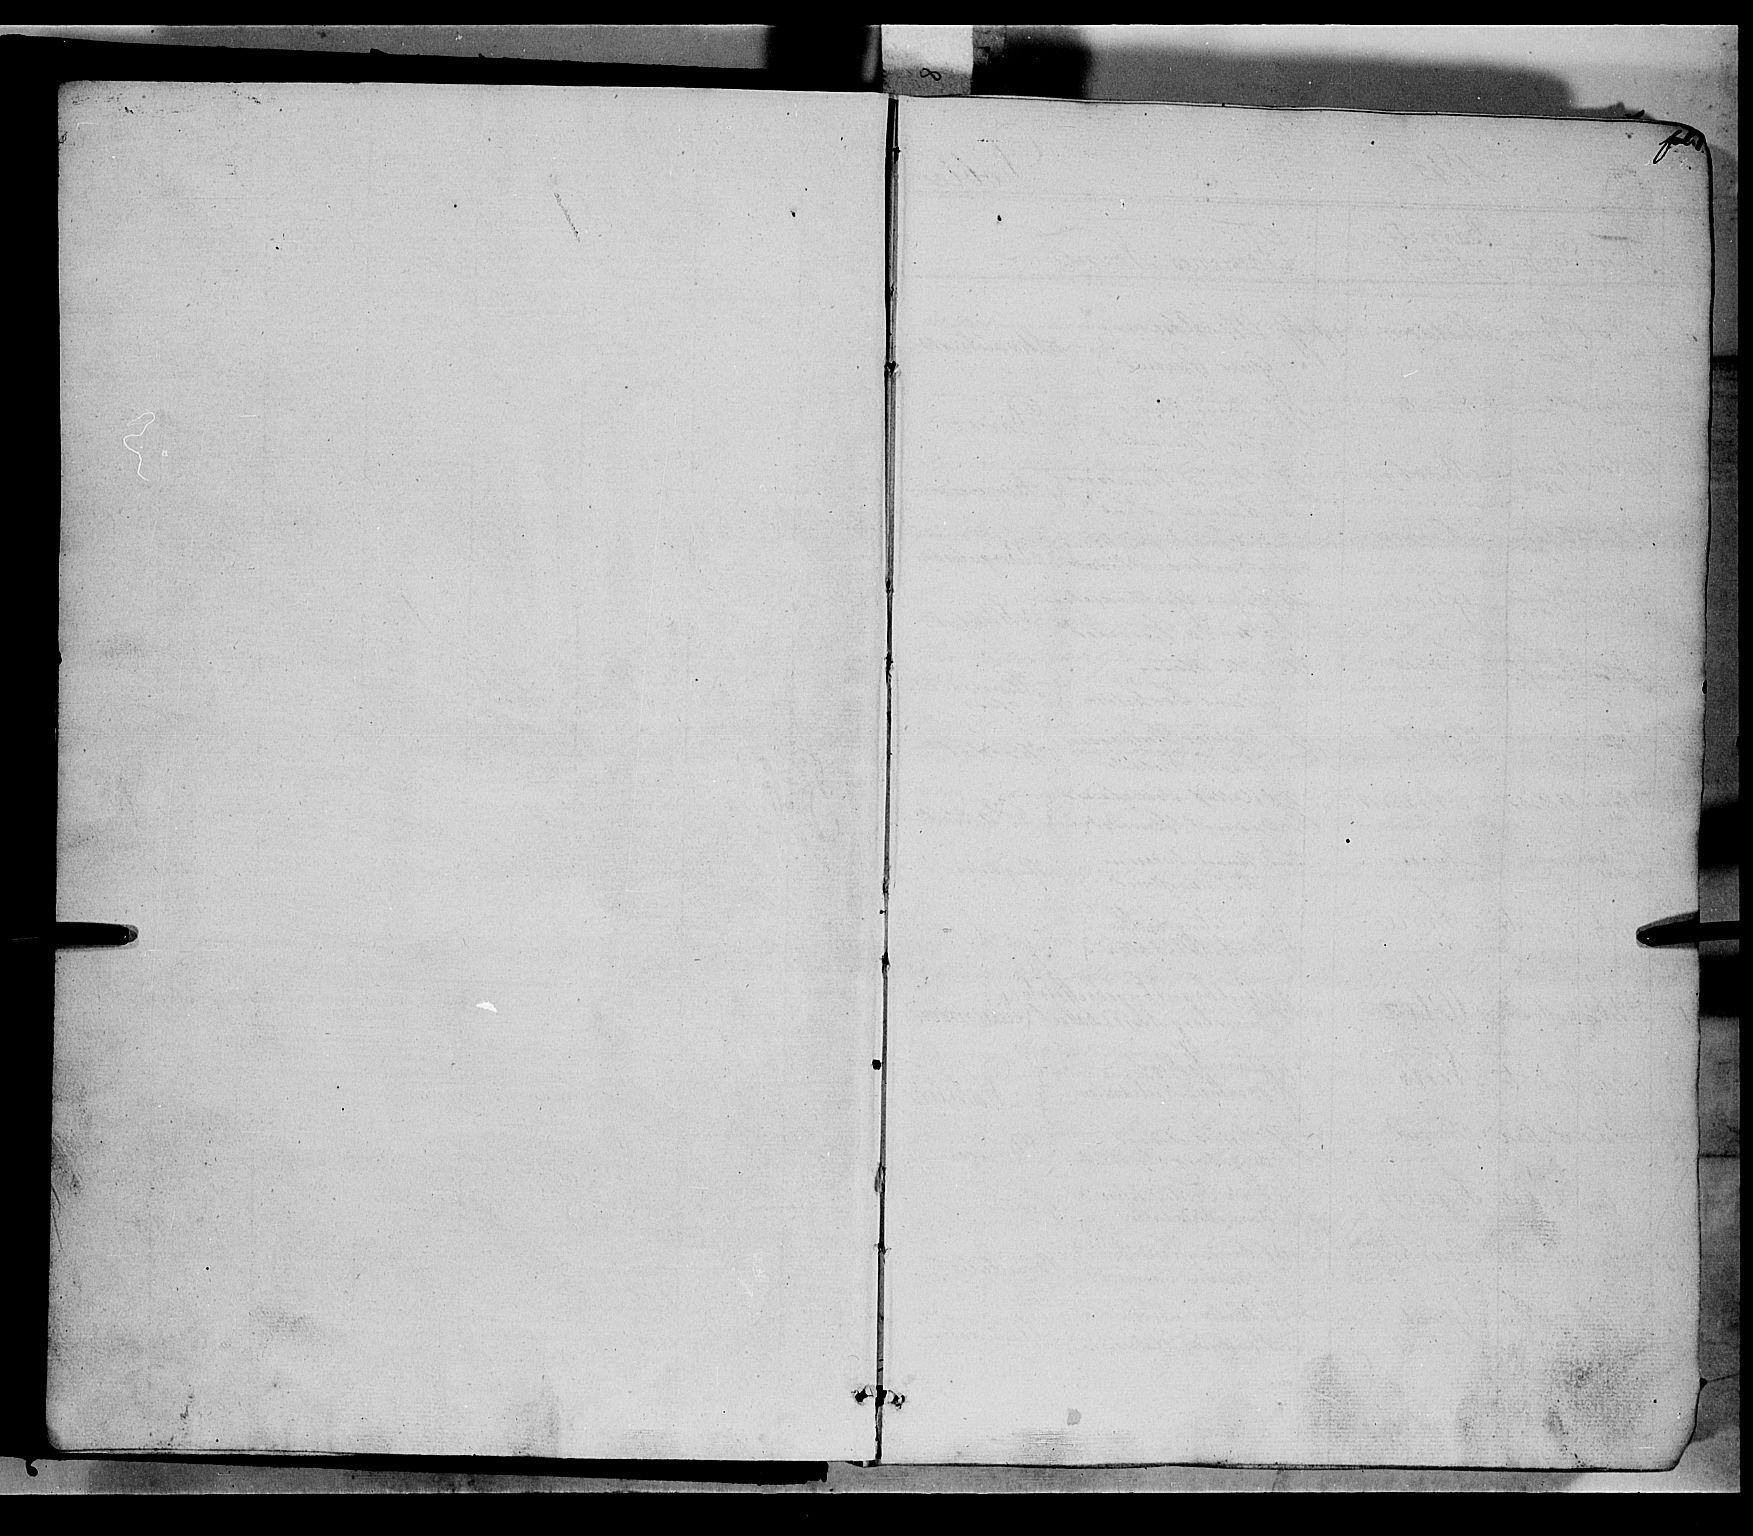 SAH, Nord-Aurdal prestekontor, Ministerialbok nr. 7, 1842-1863, s. 1